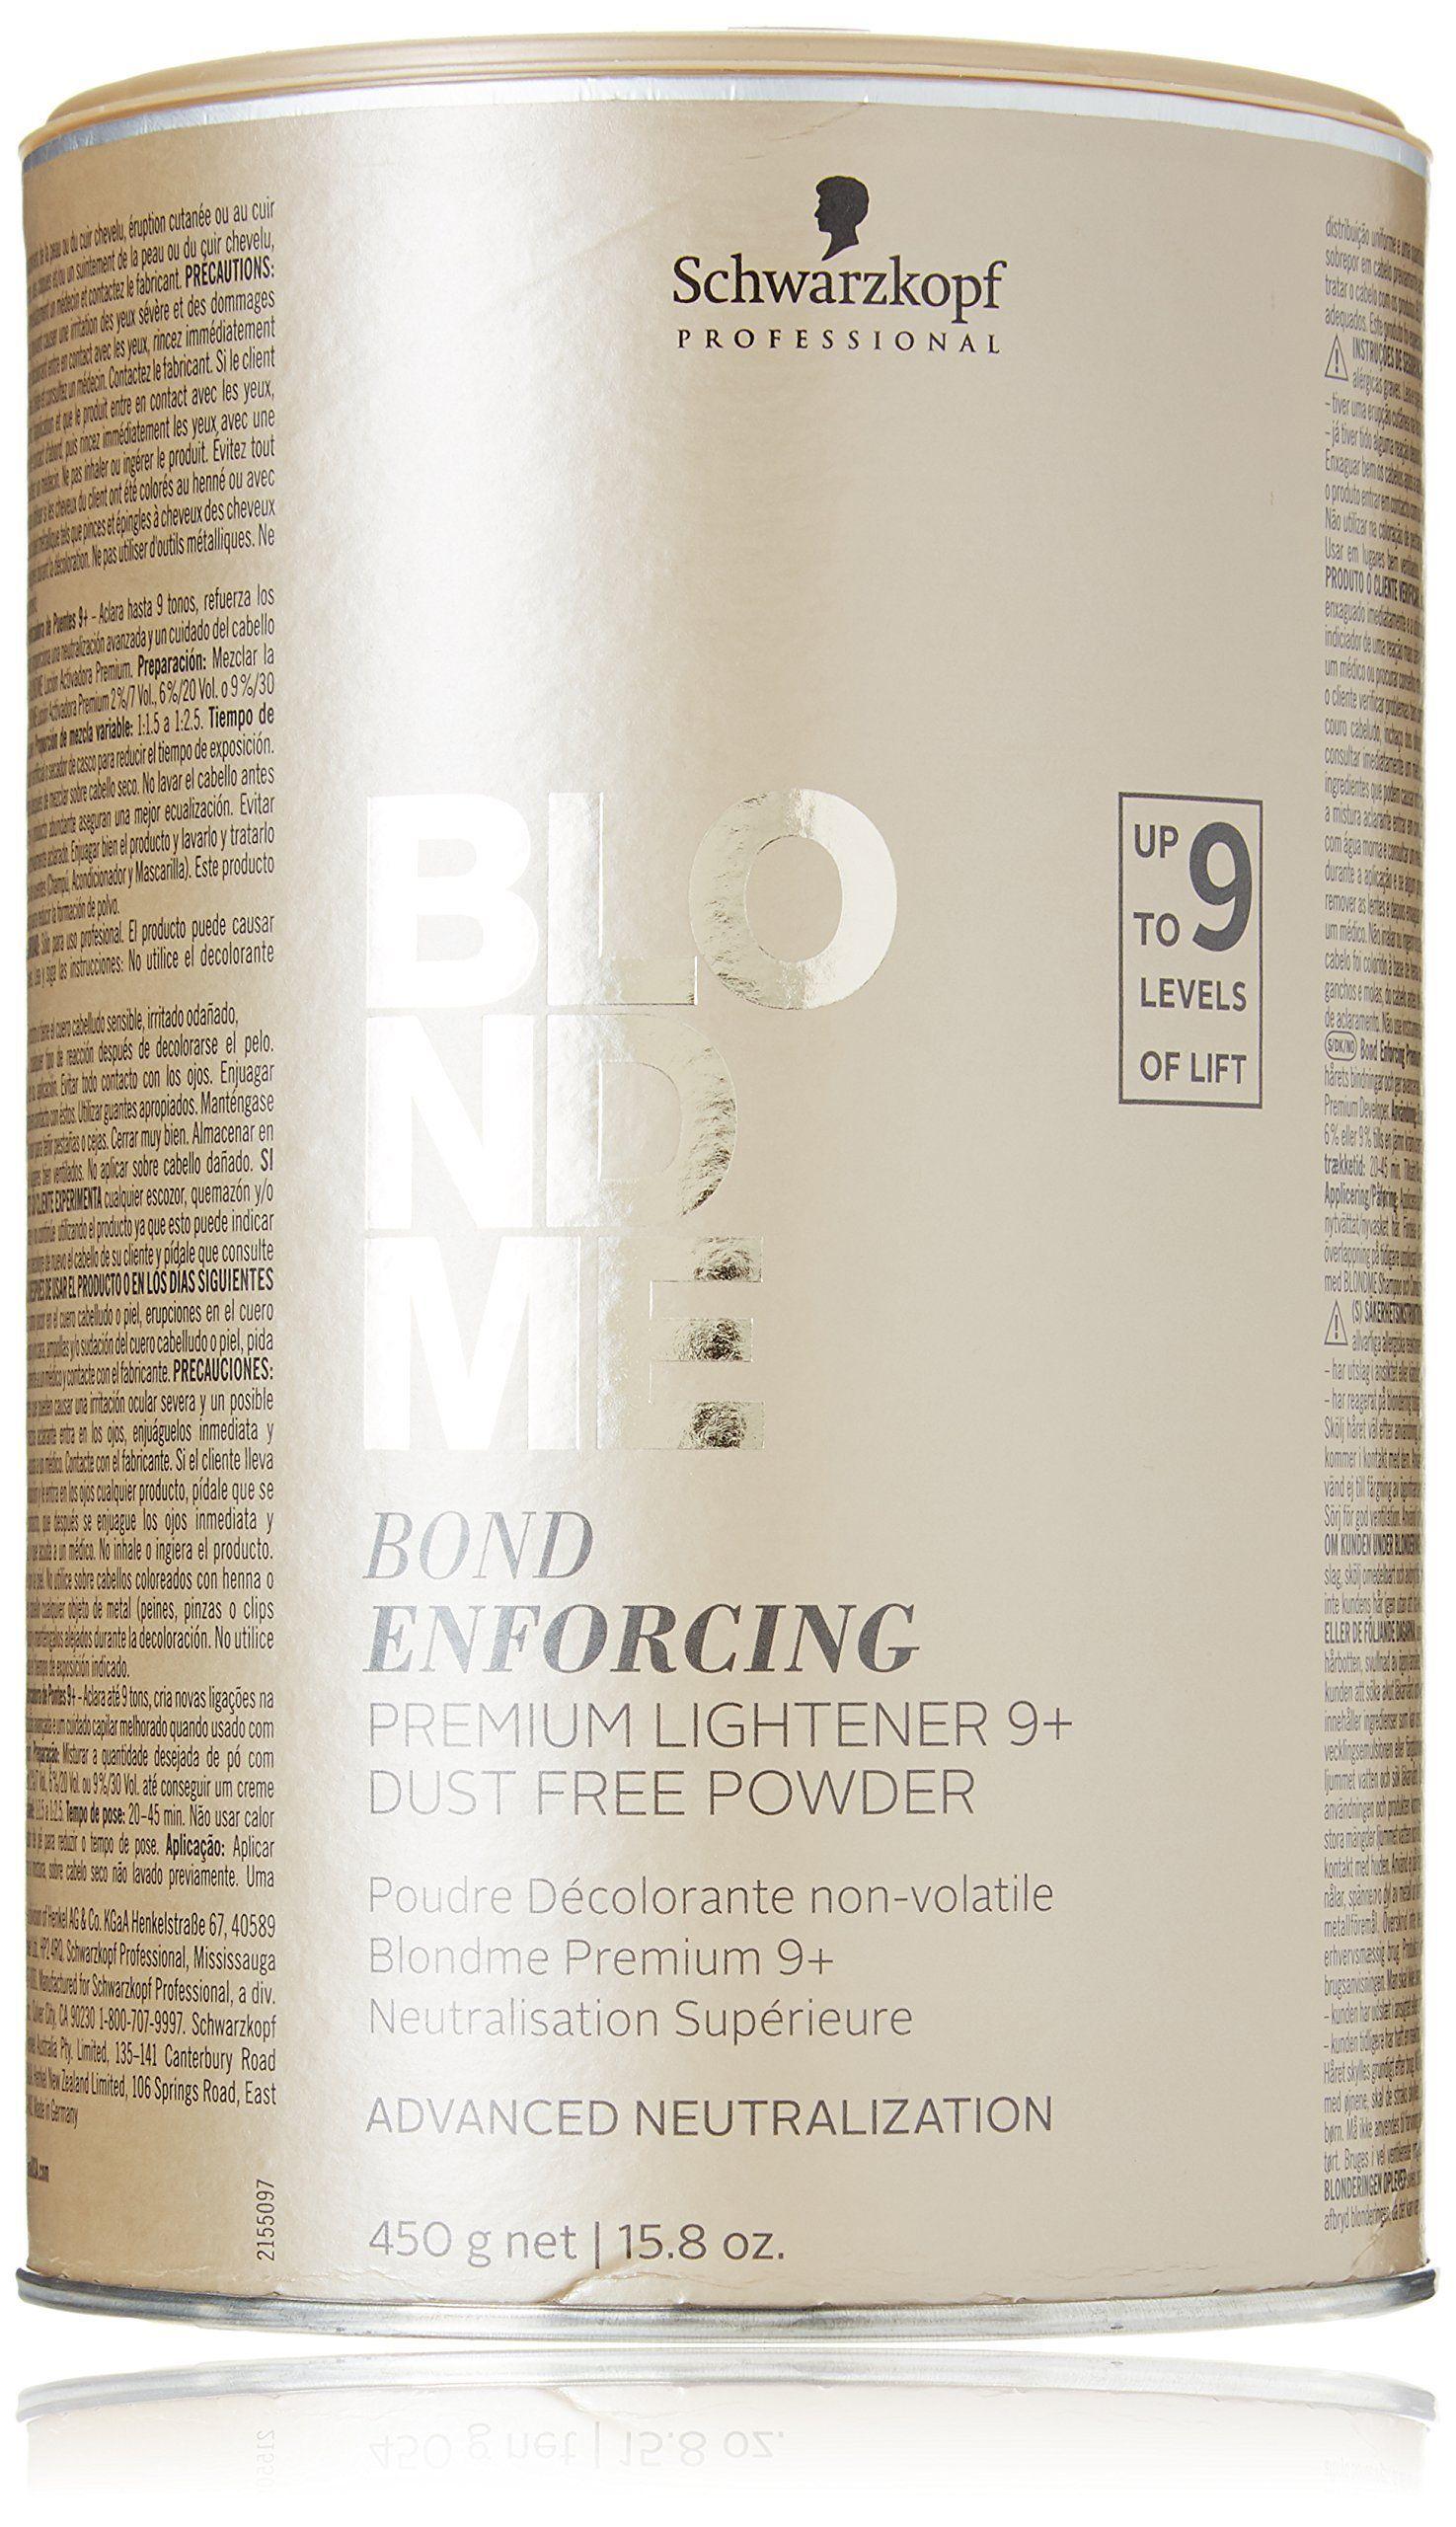 Schwarzkopf Professional Blond Me Premium Lift 9 15 8 Oz Standart Walmart Com In 2021 Best Hair Bleach Bleached Hair Best Bleach For Dark Hair